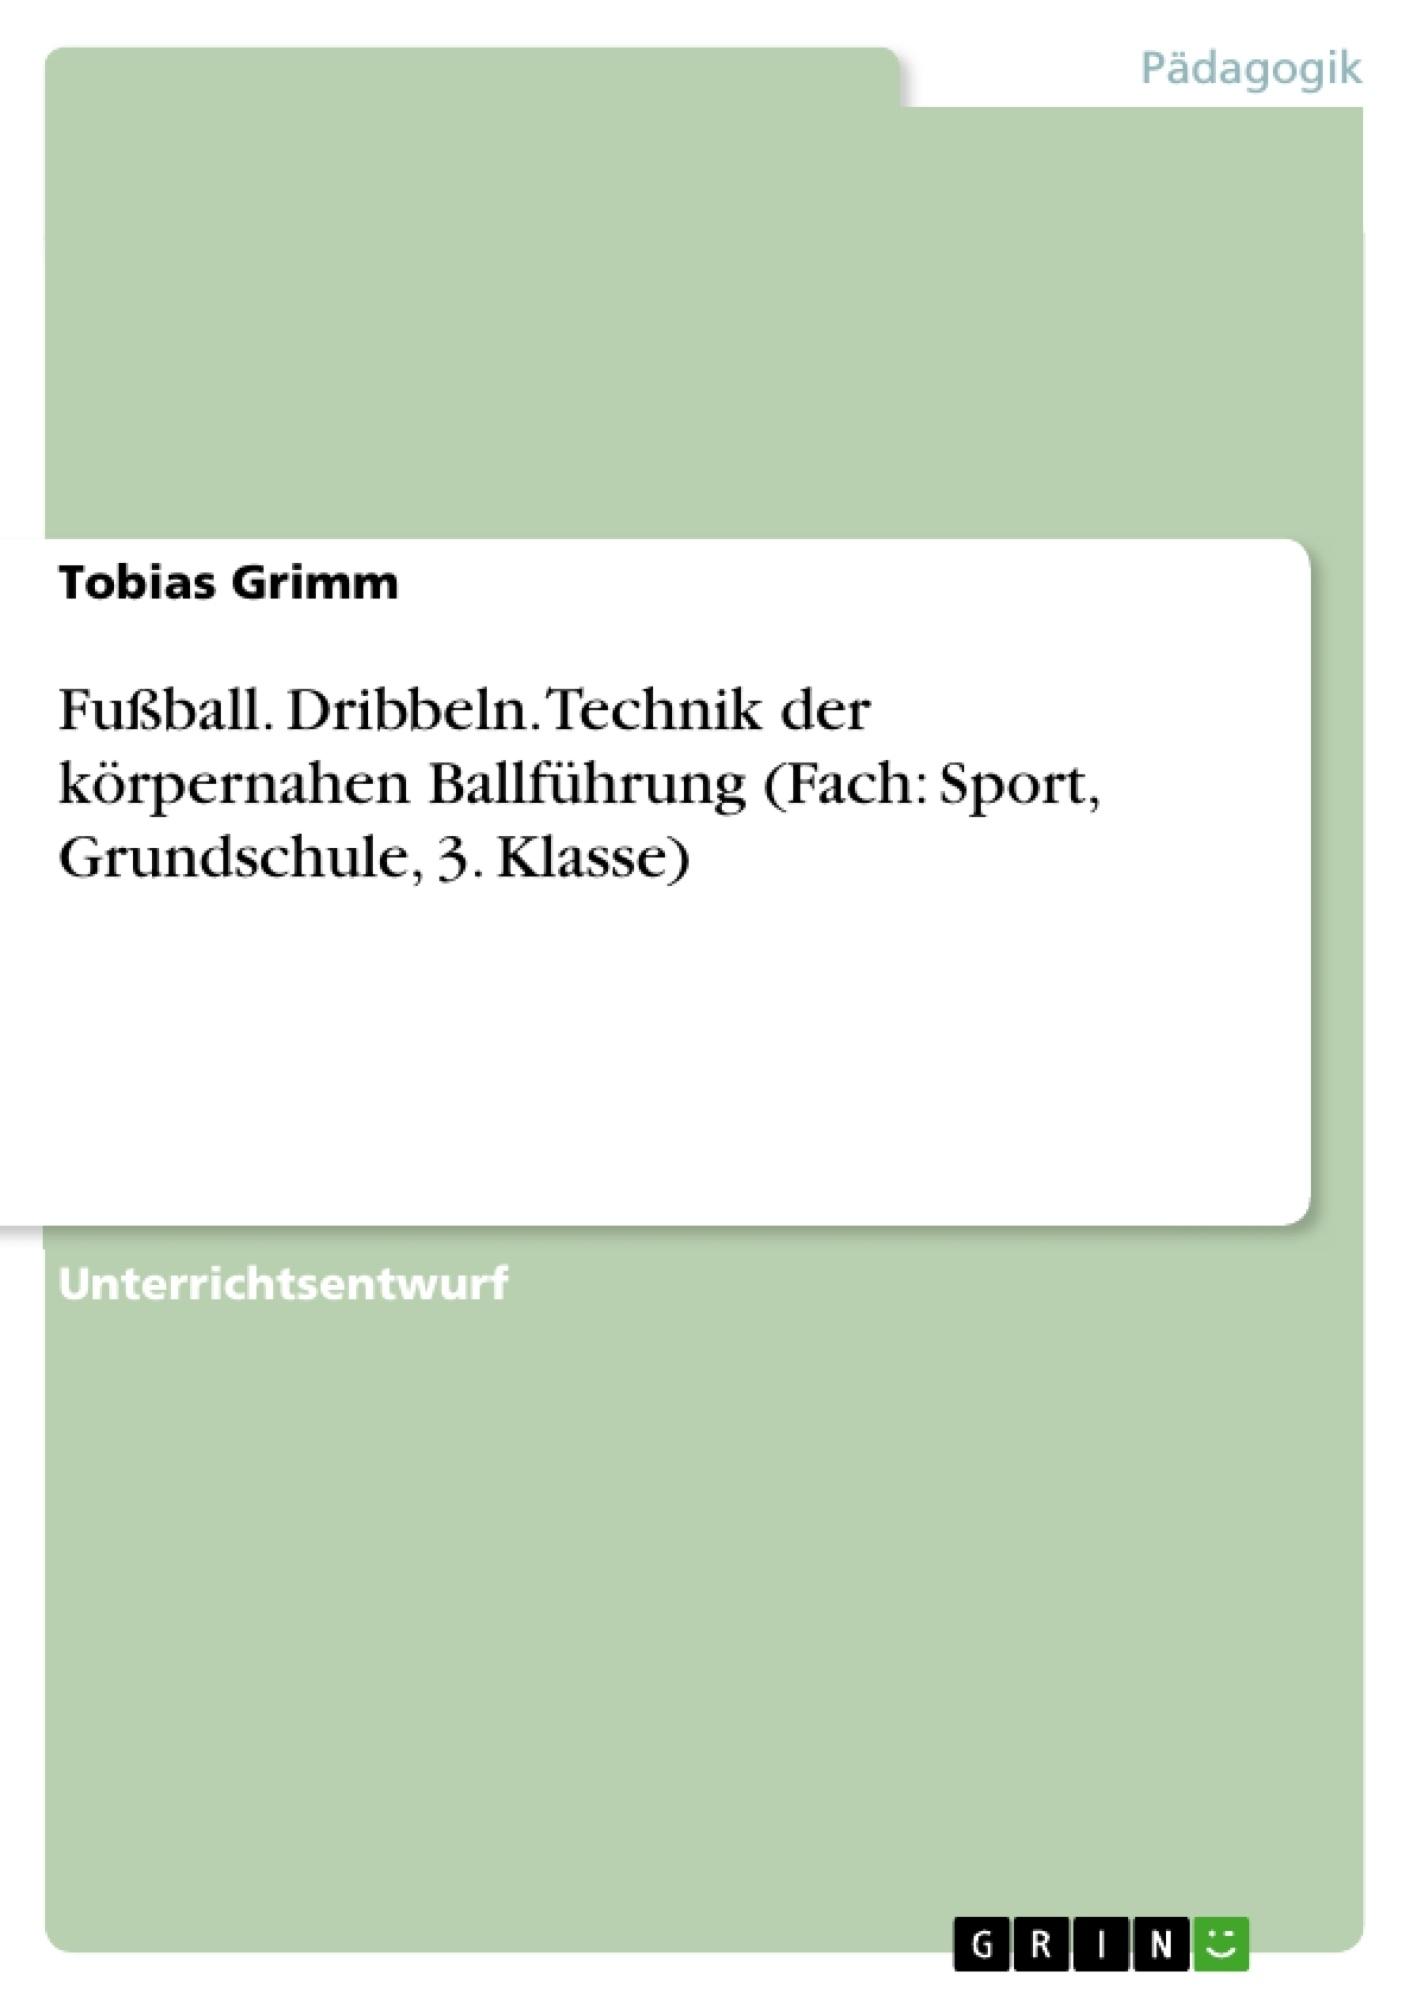 Titel: Fußball. Dribbeln. Technik der körpernahen Ballführung (Fach: Sport, Grundschule, 3. Klasse)